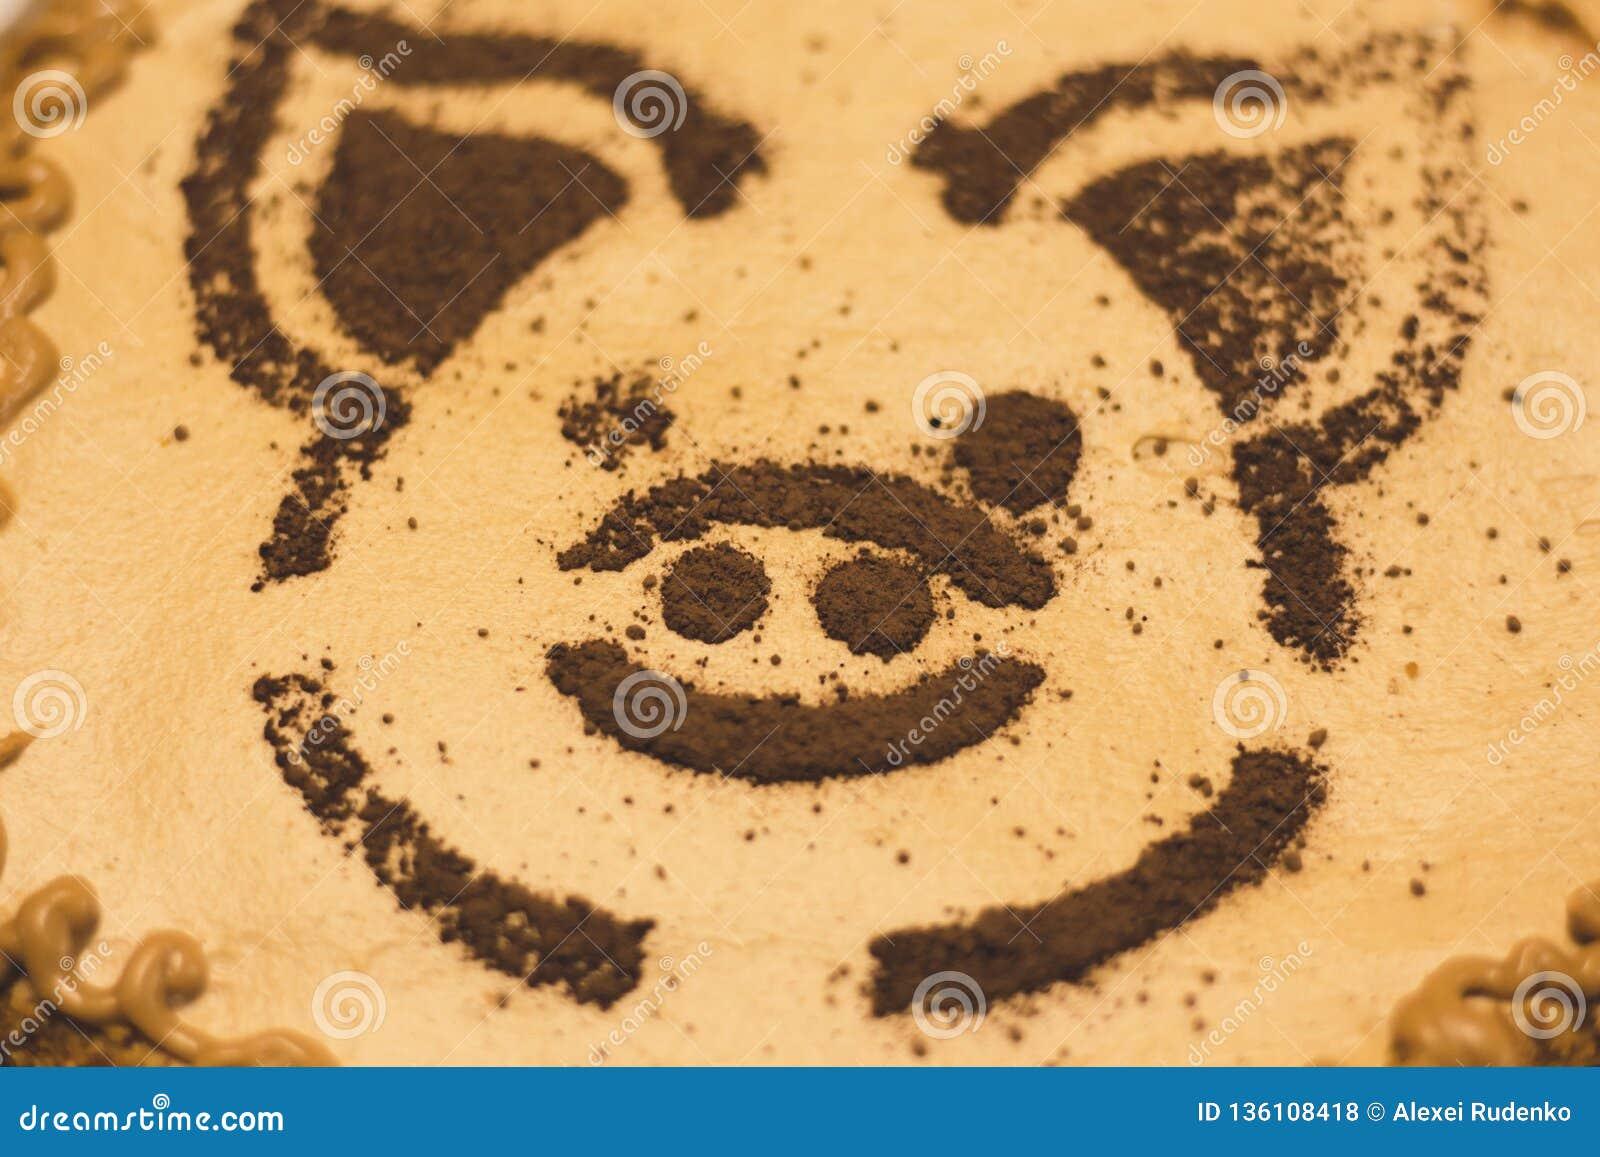 Картина на торте в форме намордника свиньи